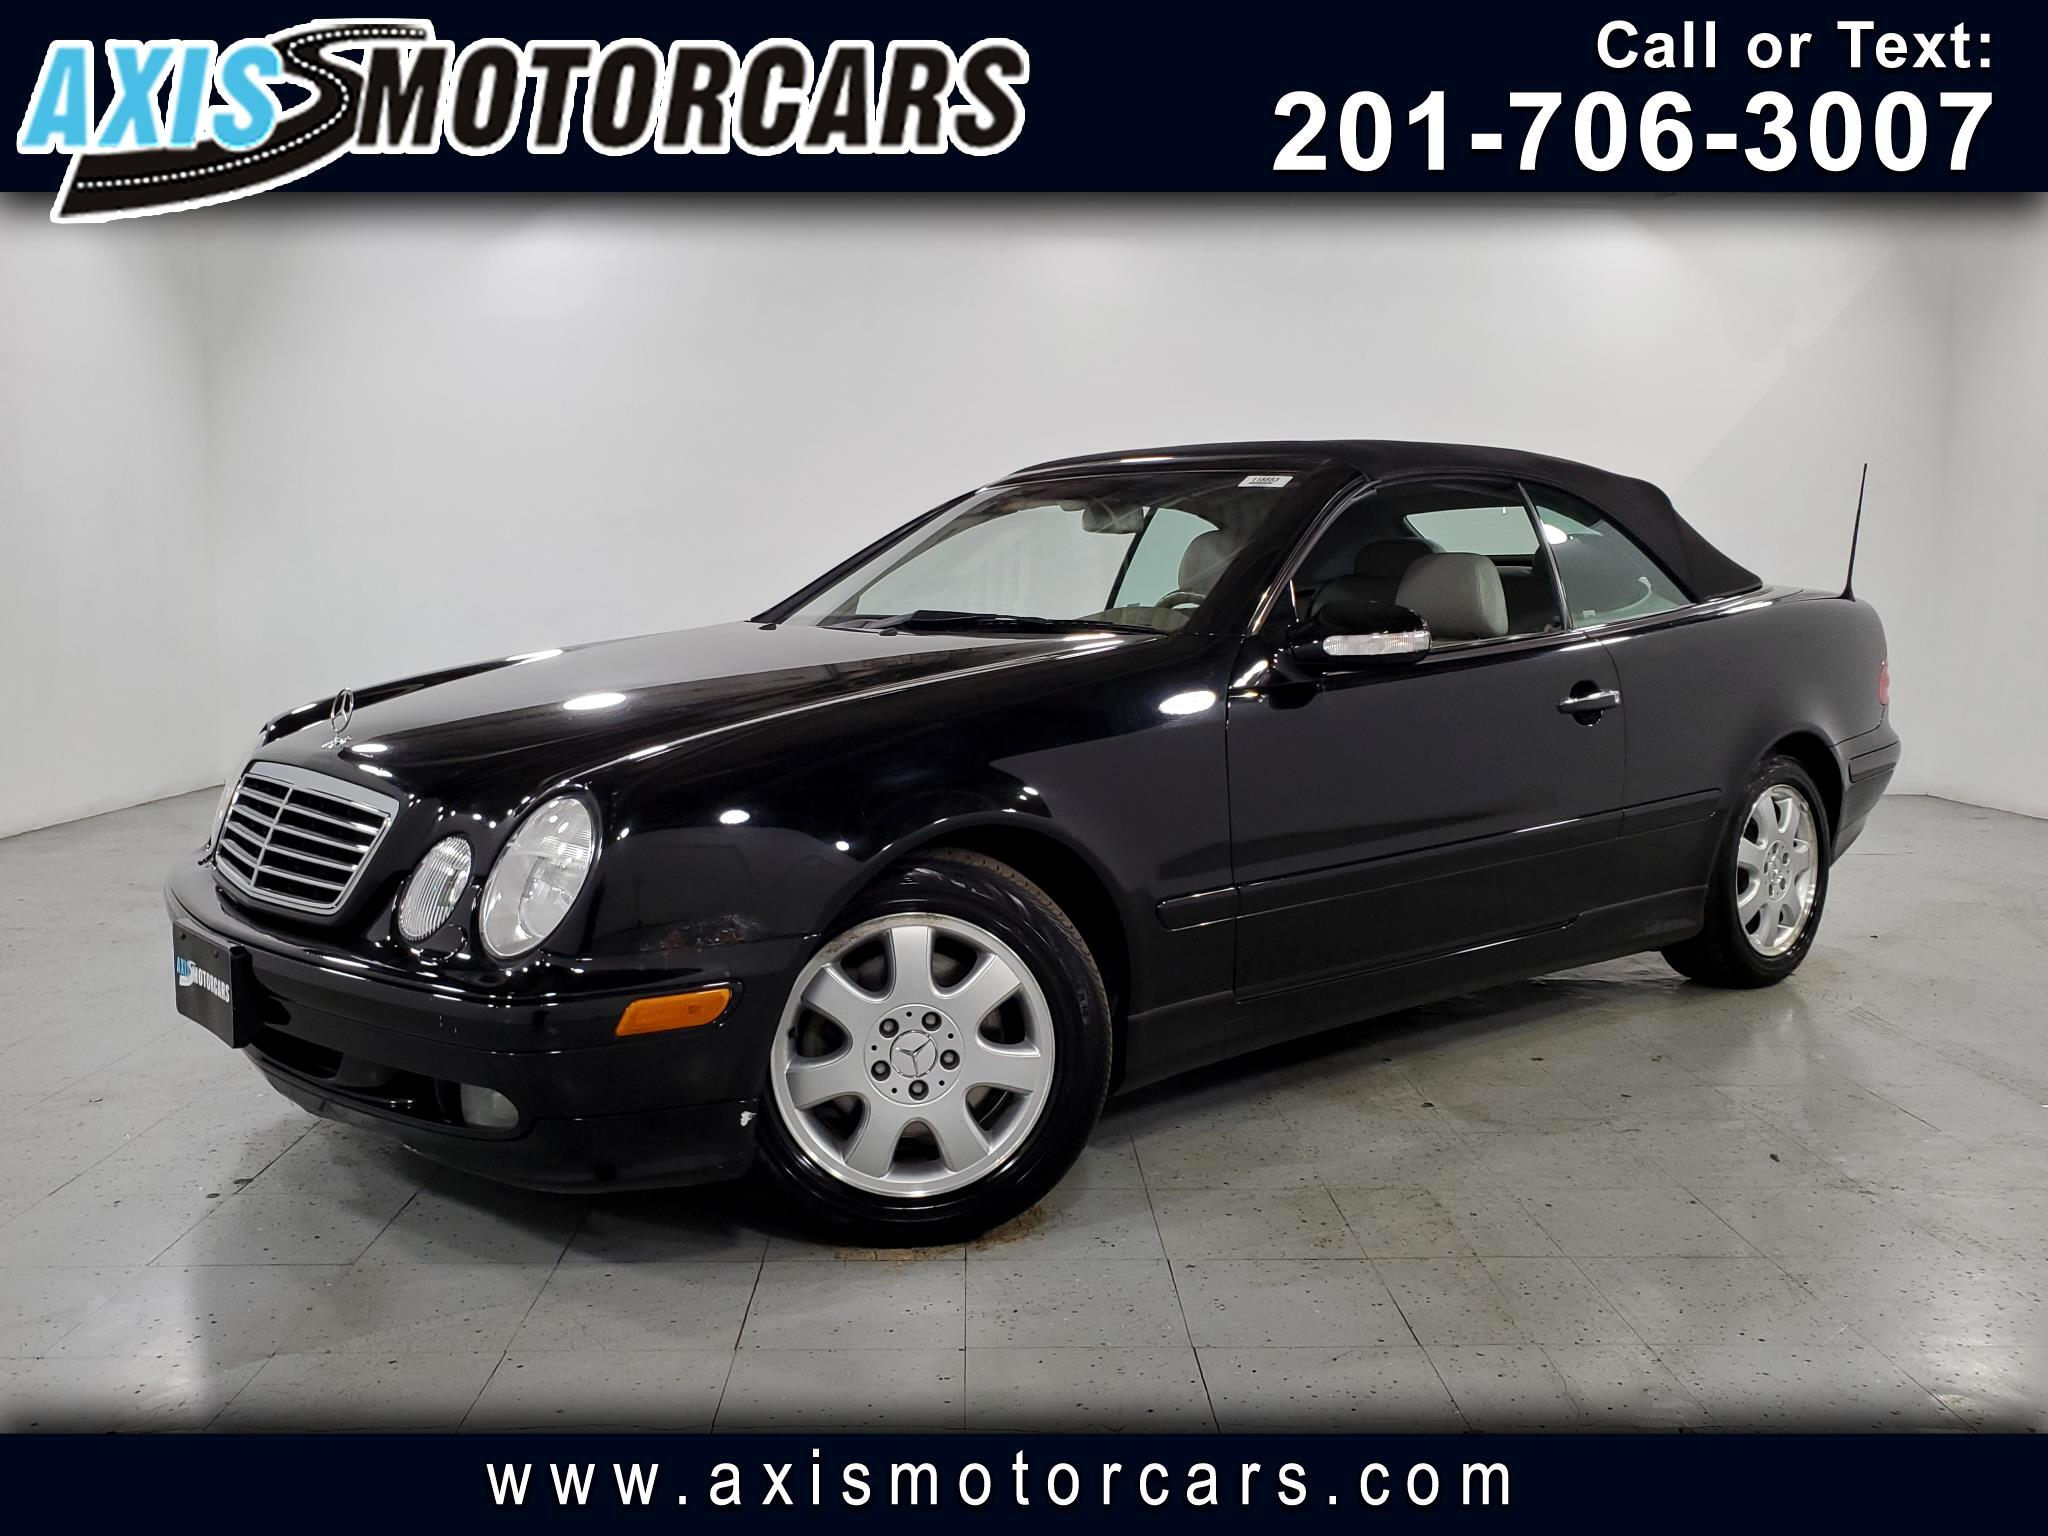 2002 Mercedes-Benz CLK-Class CLK320 Cabriolet w/Leather